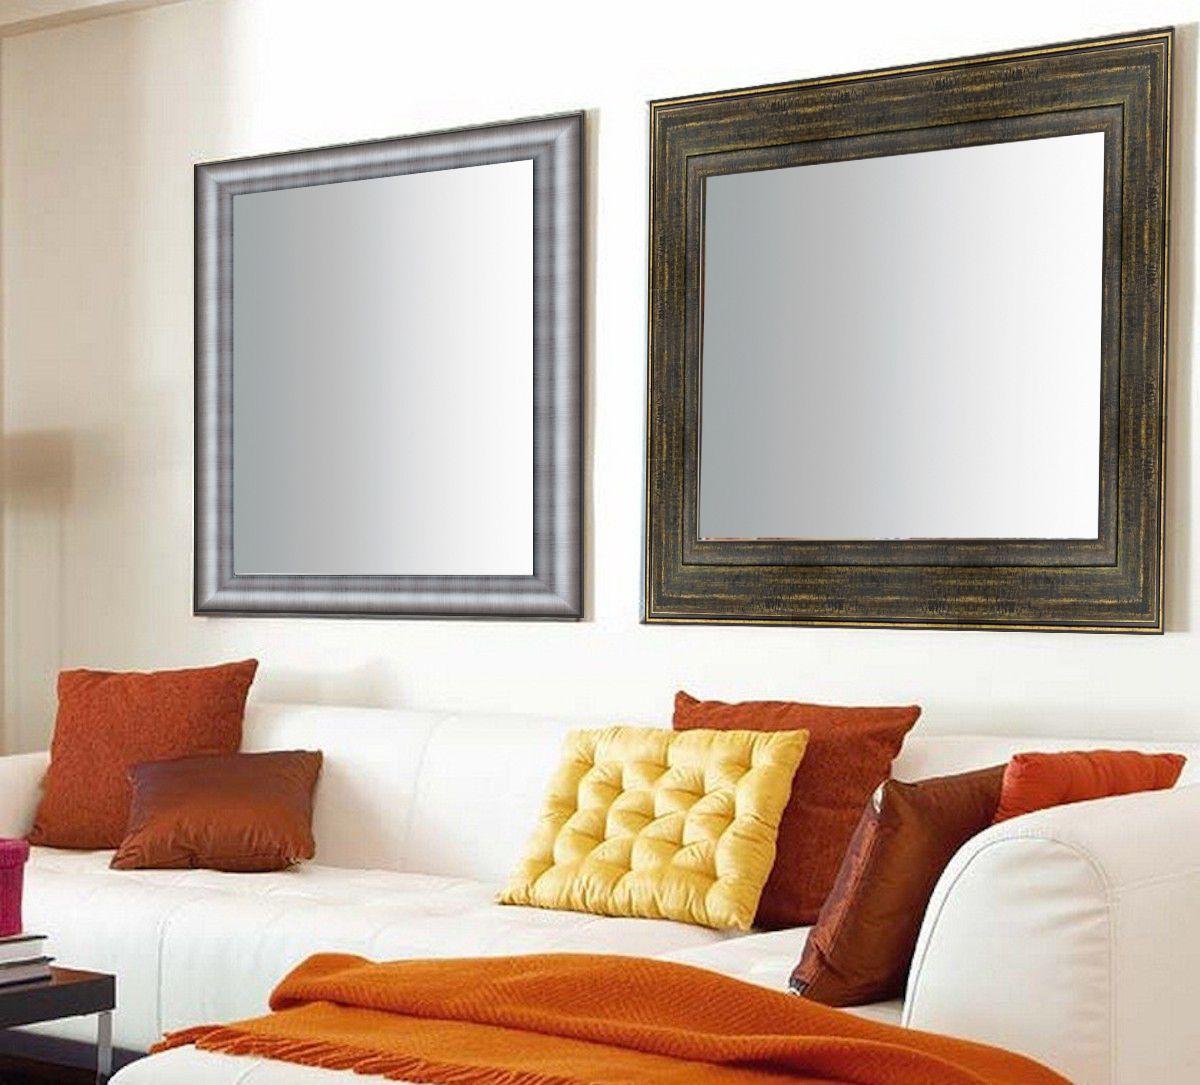 Espejos modernos para la decoraci n de tu hogar for Decoracion de espejos